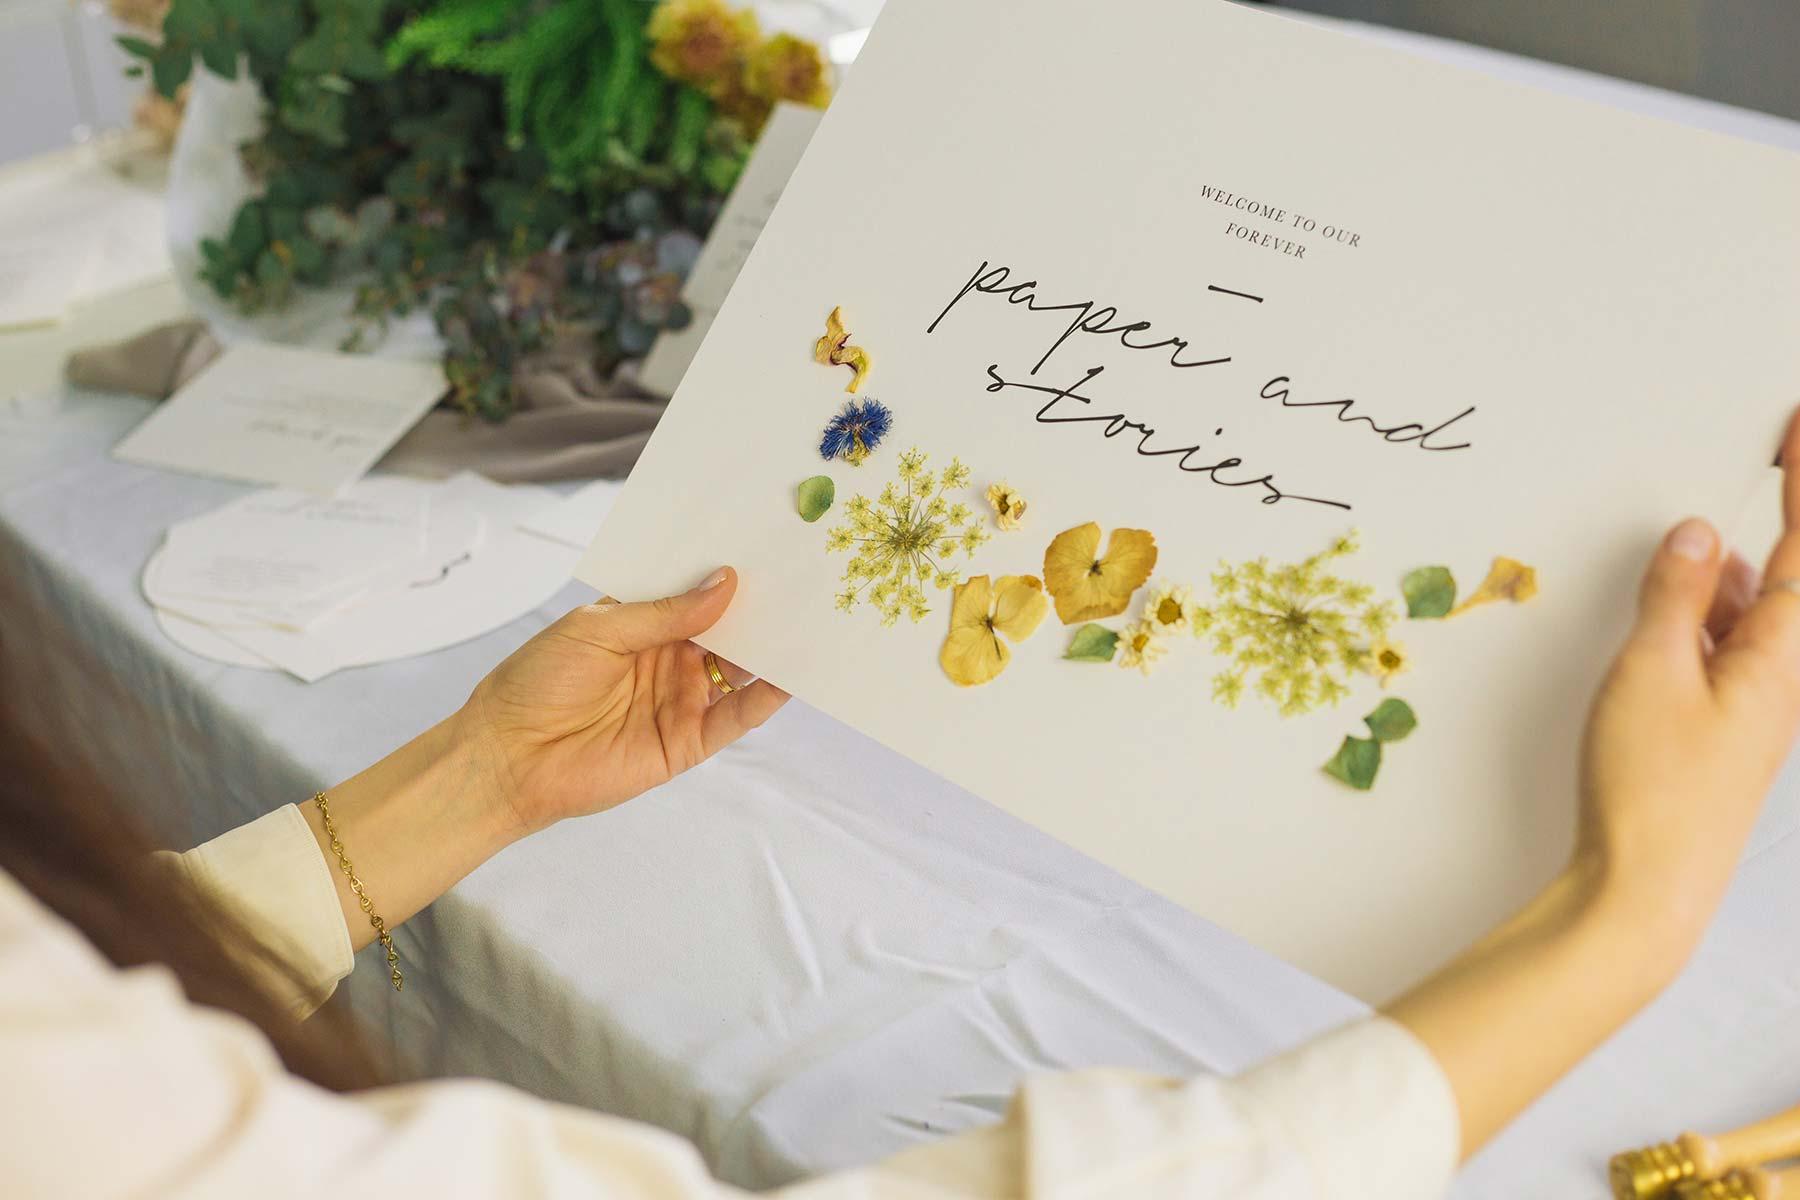 Partecipazioni Matrimonio Firenze.Papries Partecipazioni Matrimonio Primavera Firenze Papries